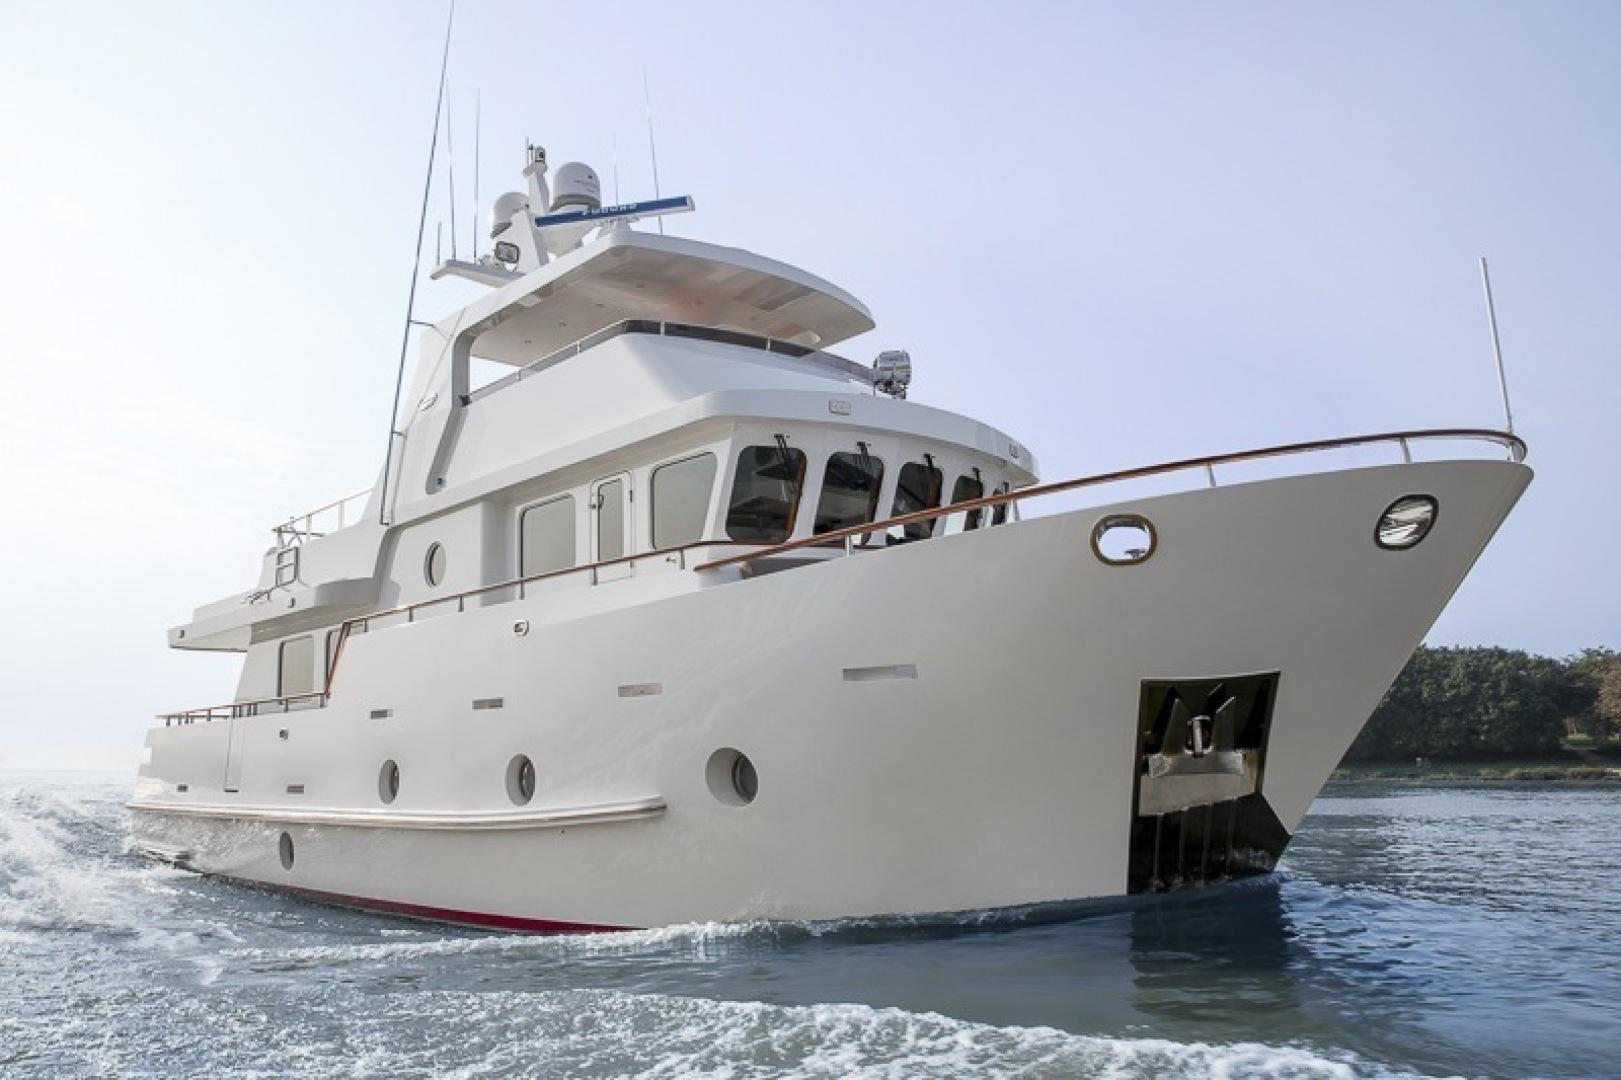 Bering-65 Bering Yacht 2013-Namaste Dania-Florida-United States-1401056   Thumbnail